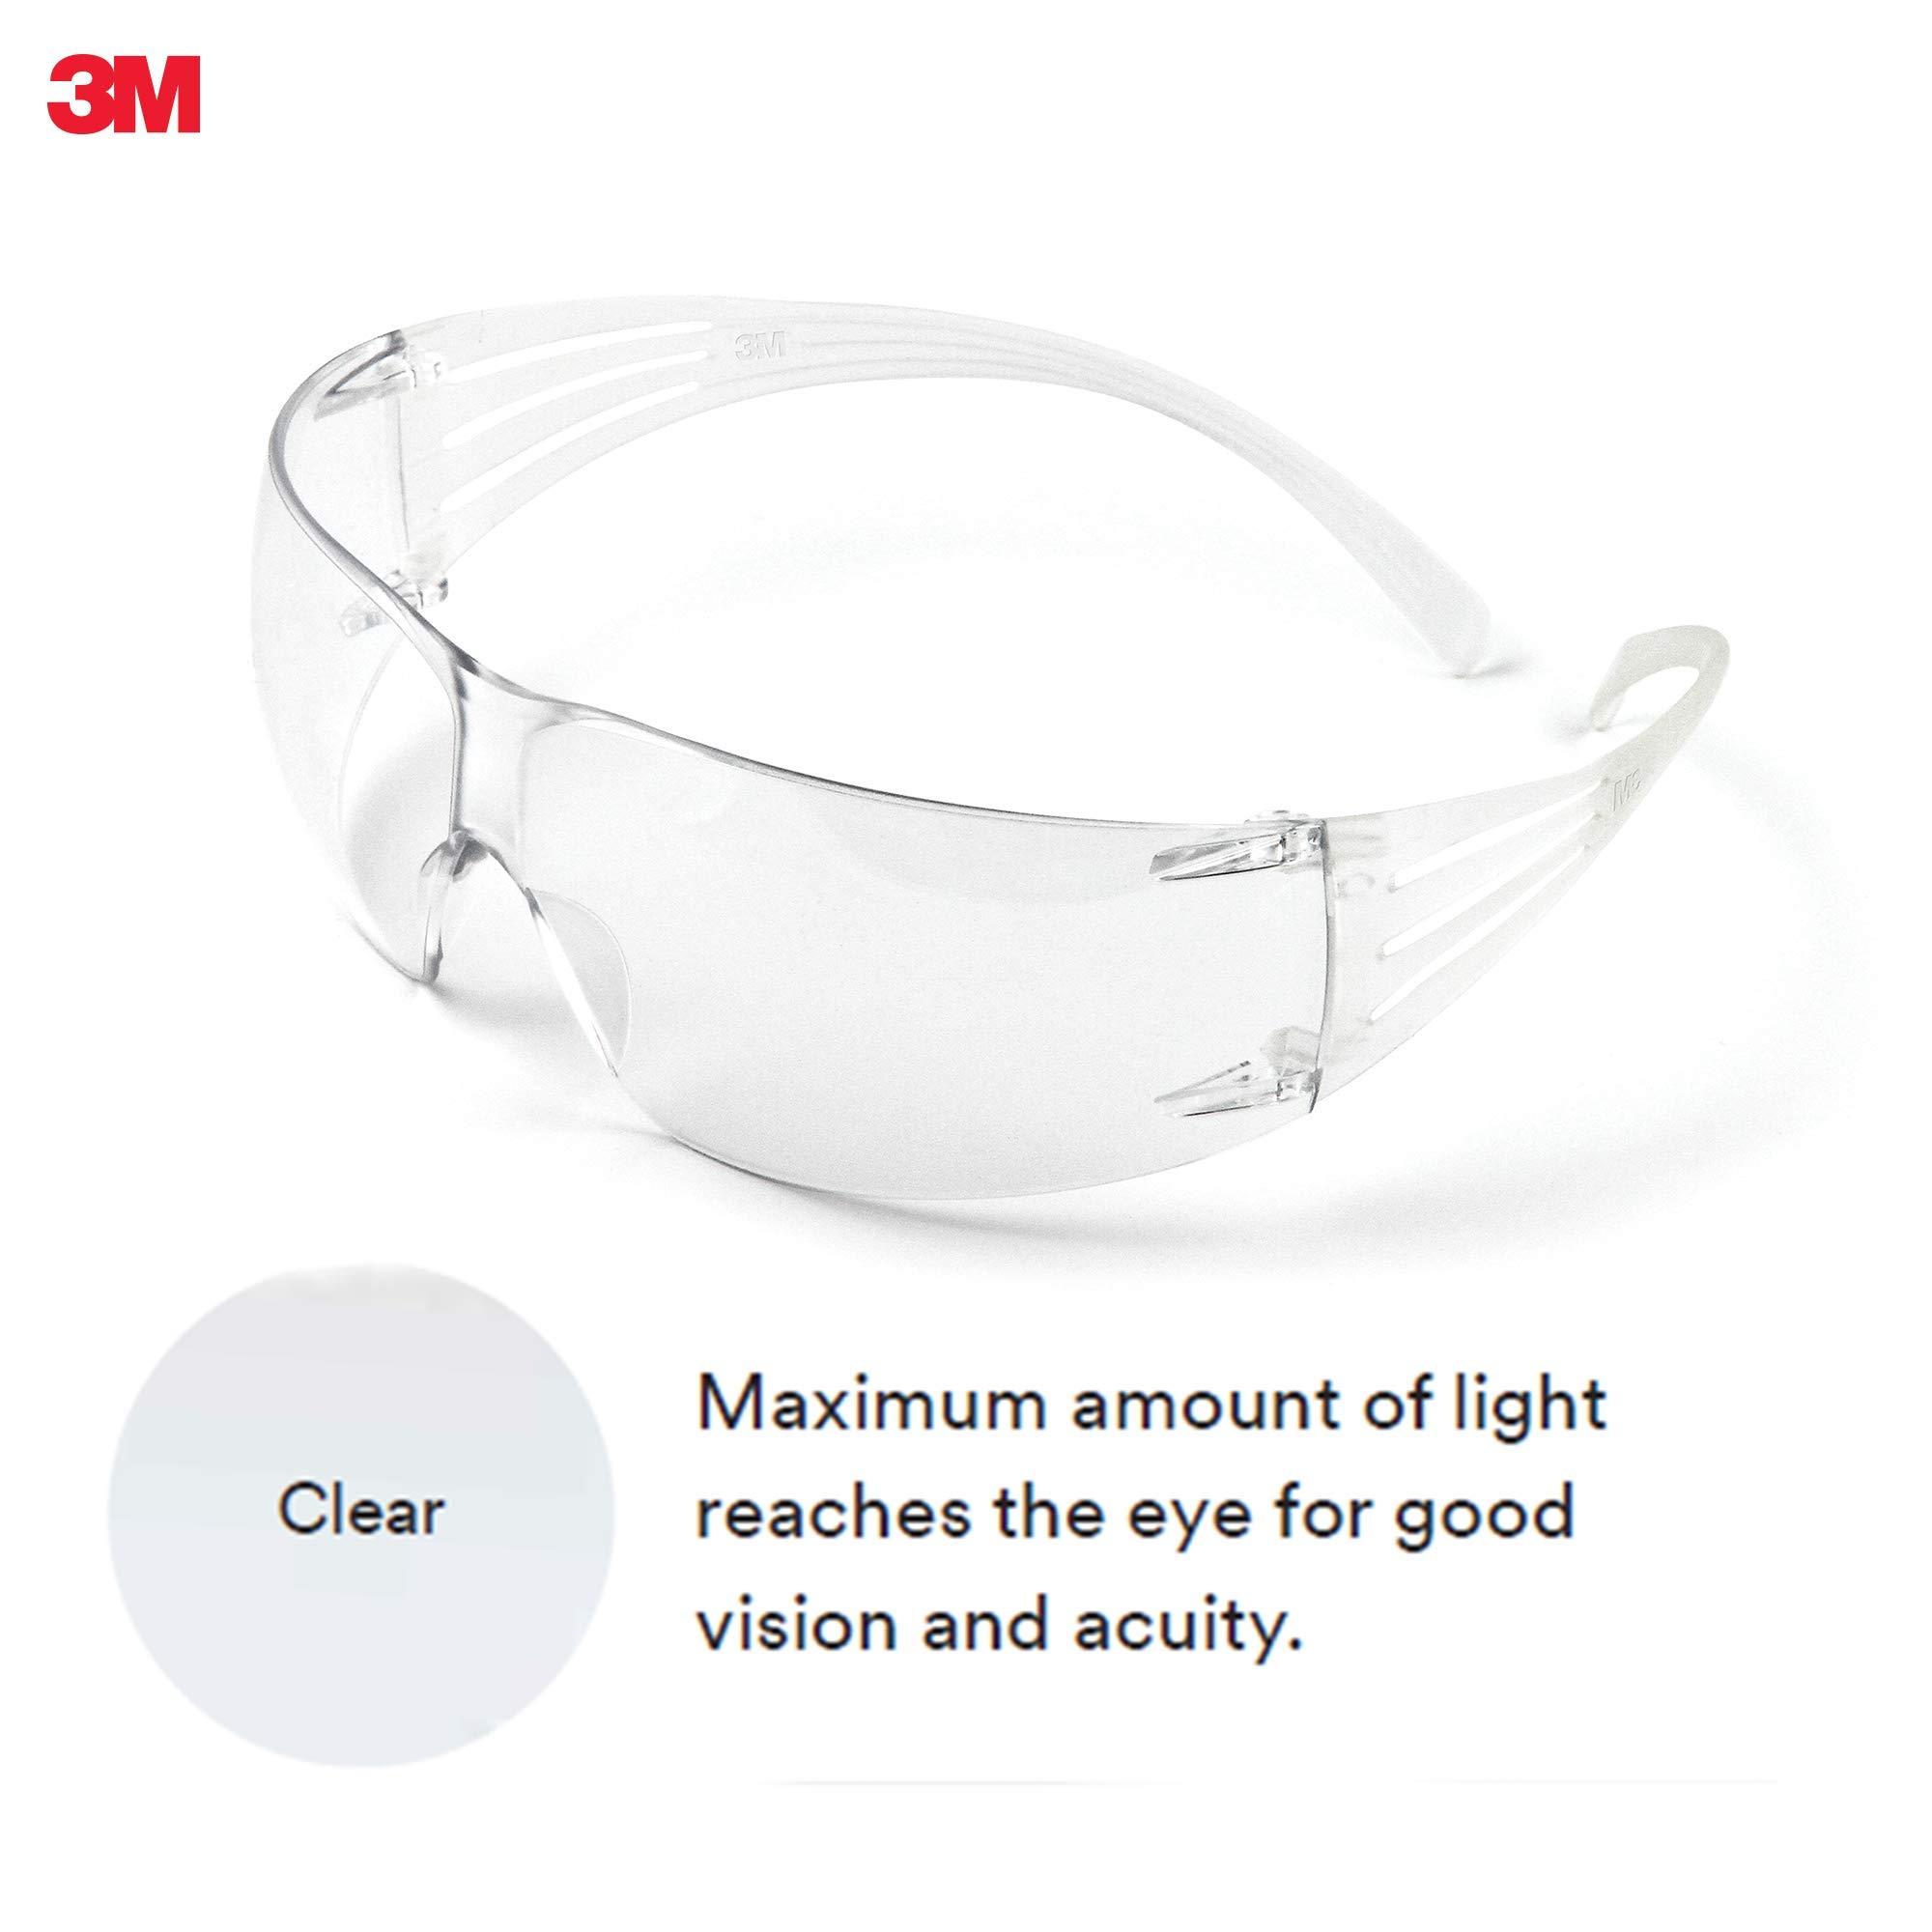 3M SecureFit, Protective Eyewear, SF201AF, CLEAR